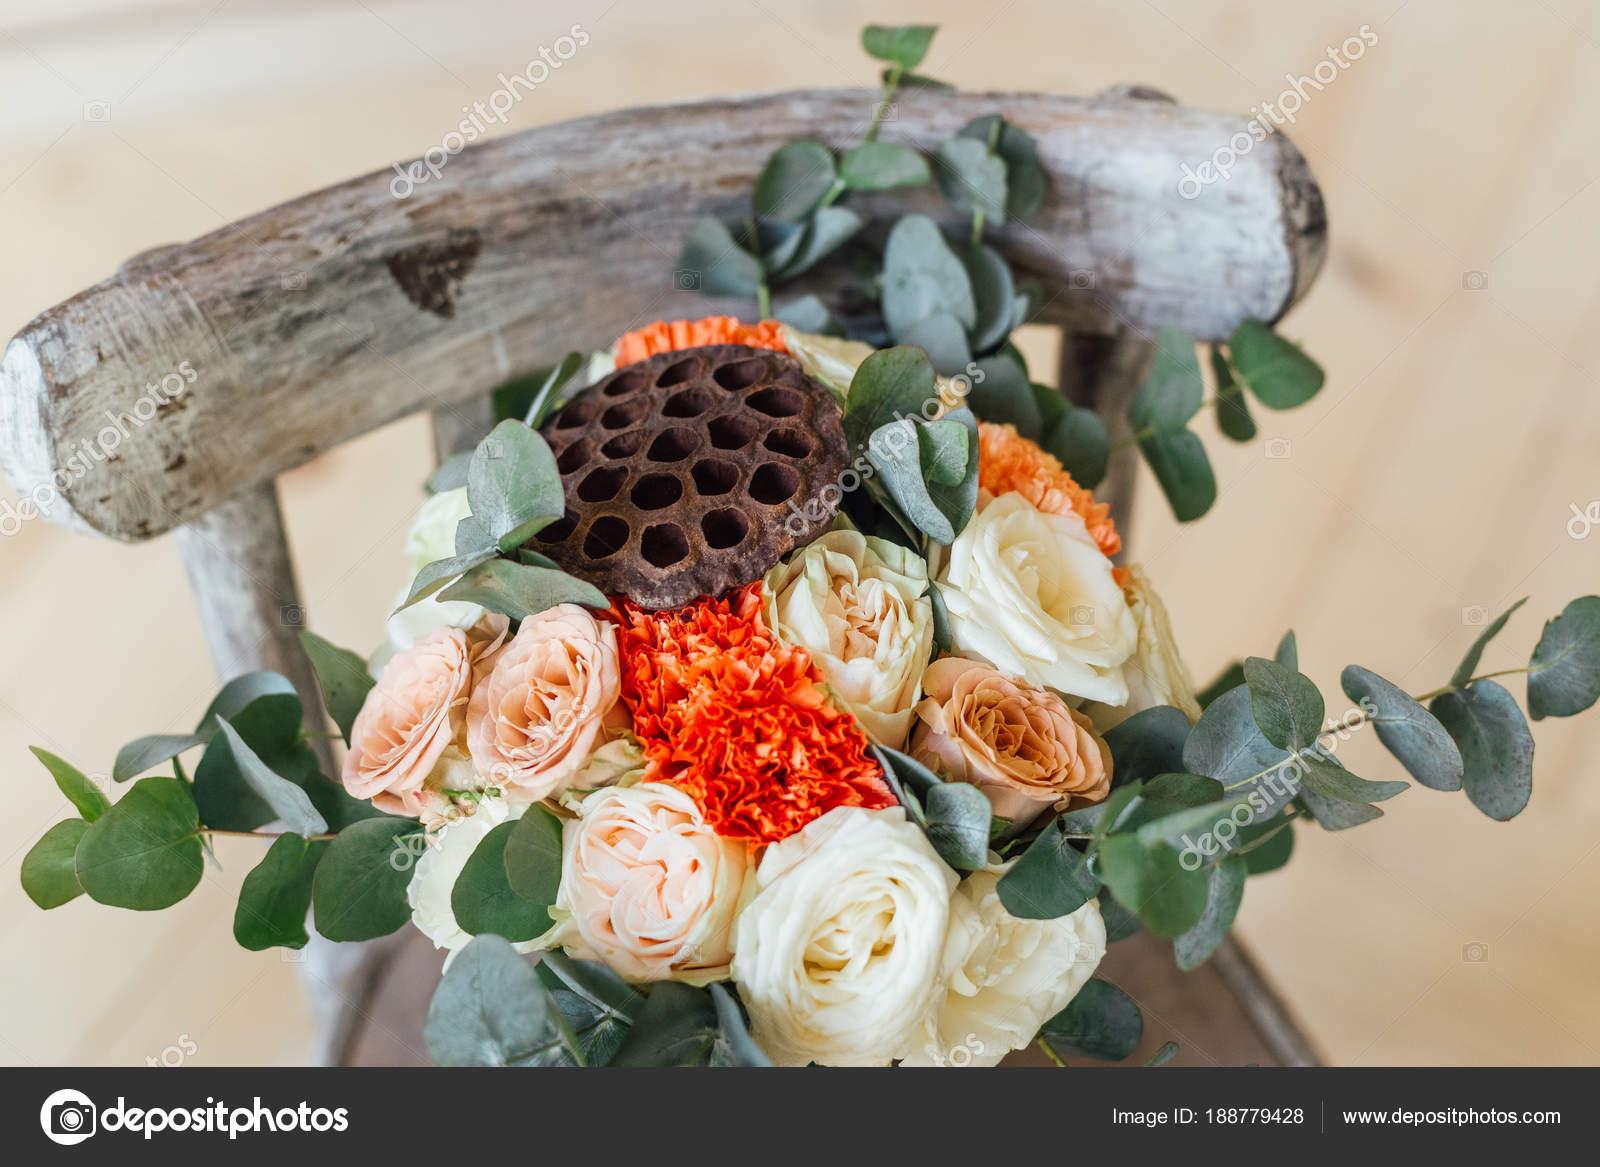 Close photo beautiful wedding bouquet flowers wooden chair close photo beautiful wedding bouquet flowers wooden chair background stock photo izmirmasajfo